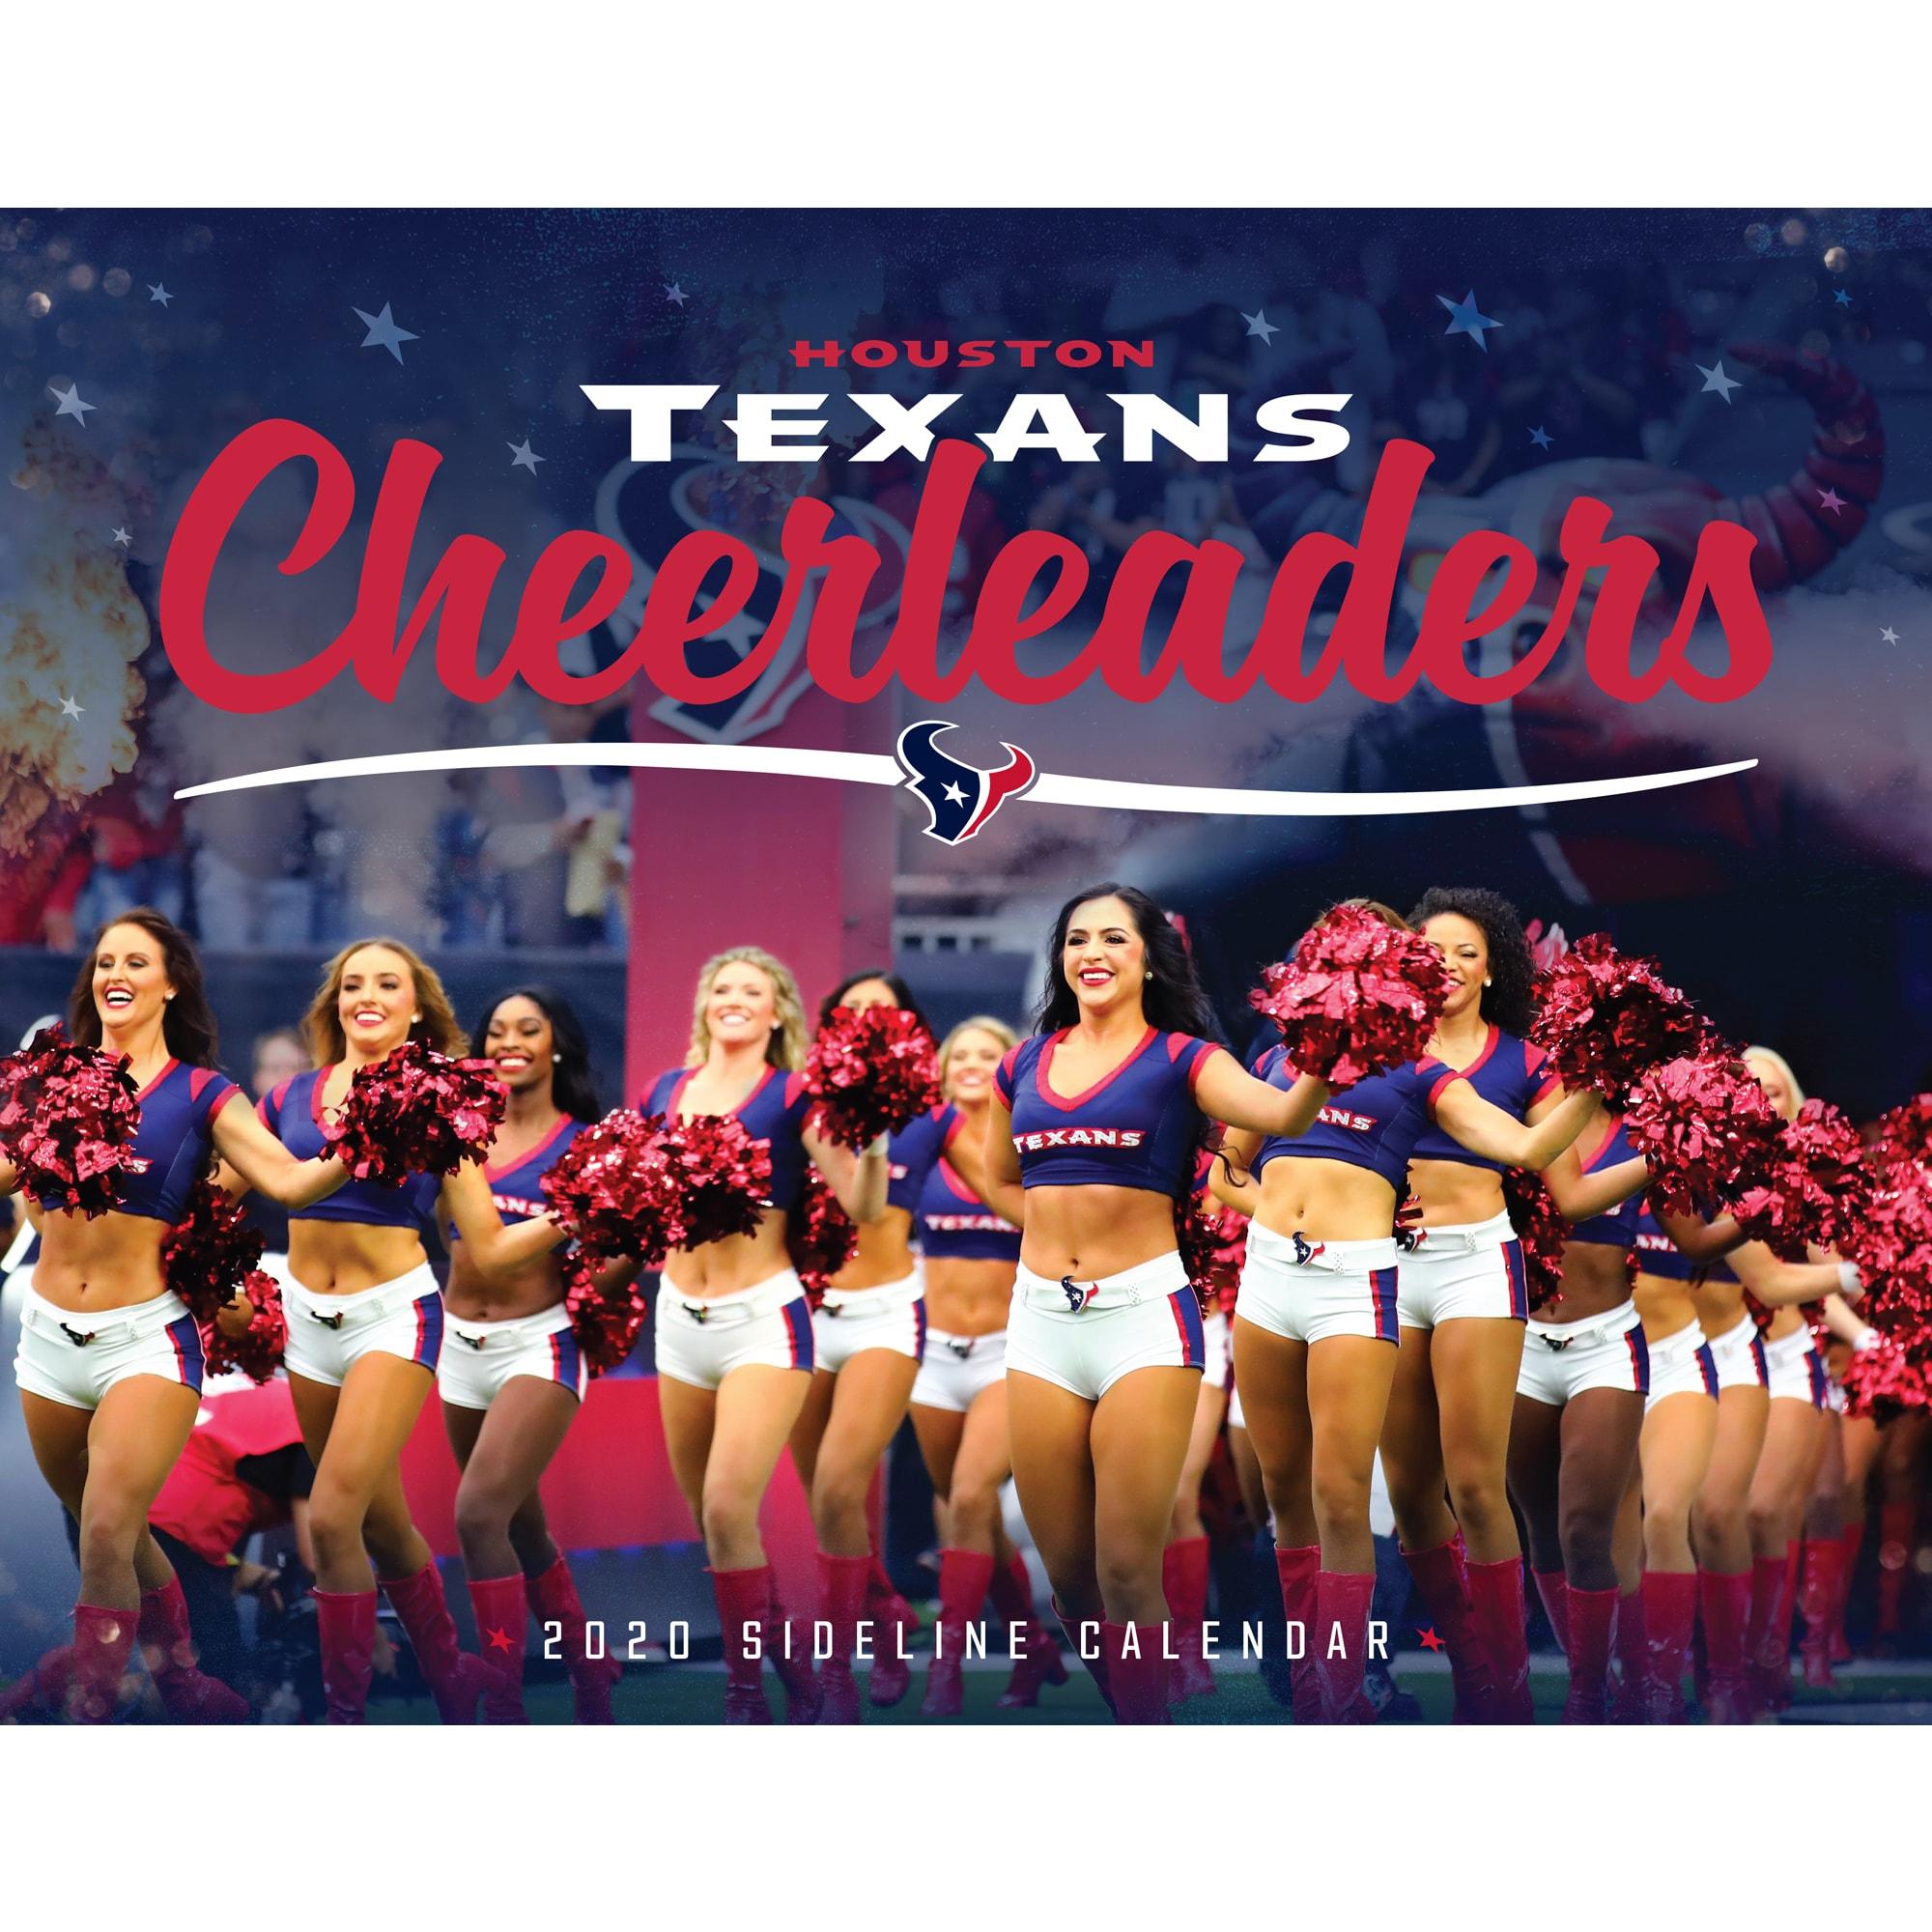 Houston Texans 2020 Cheerleaders Sideline Calendar